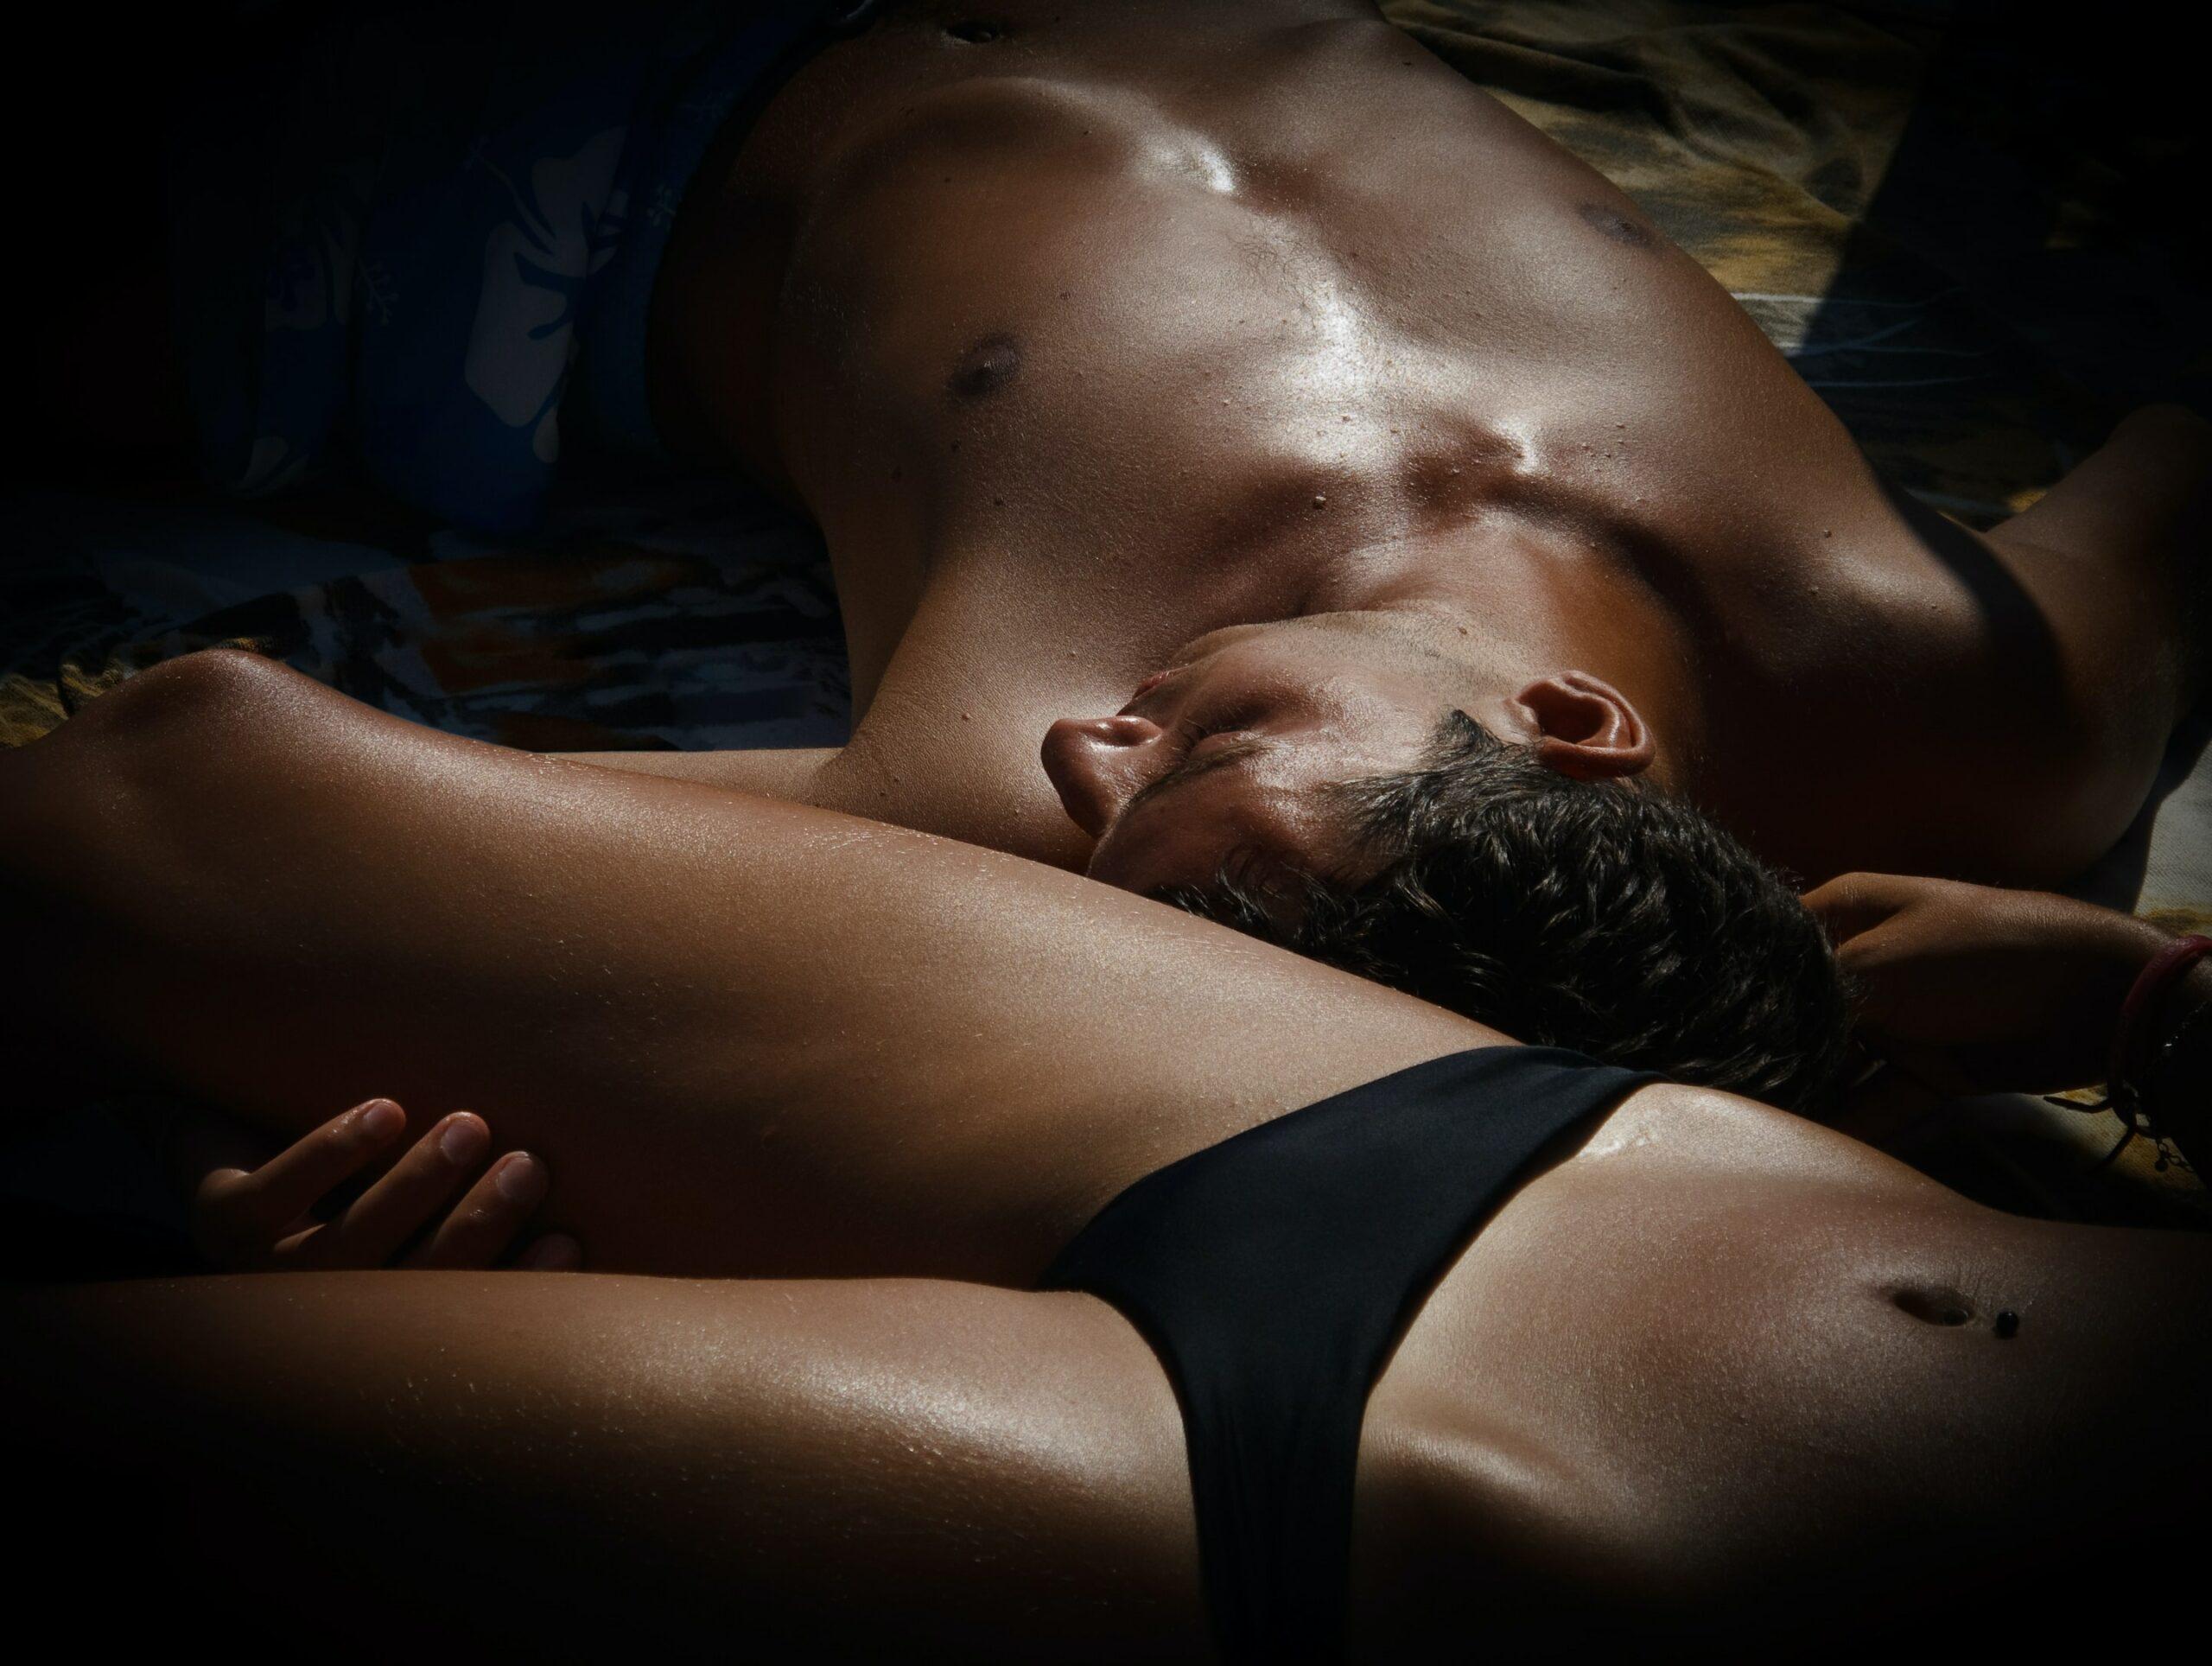 vidar-nordli-mathise steamy sex